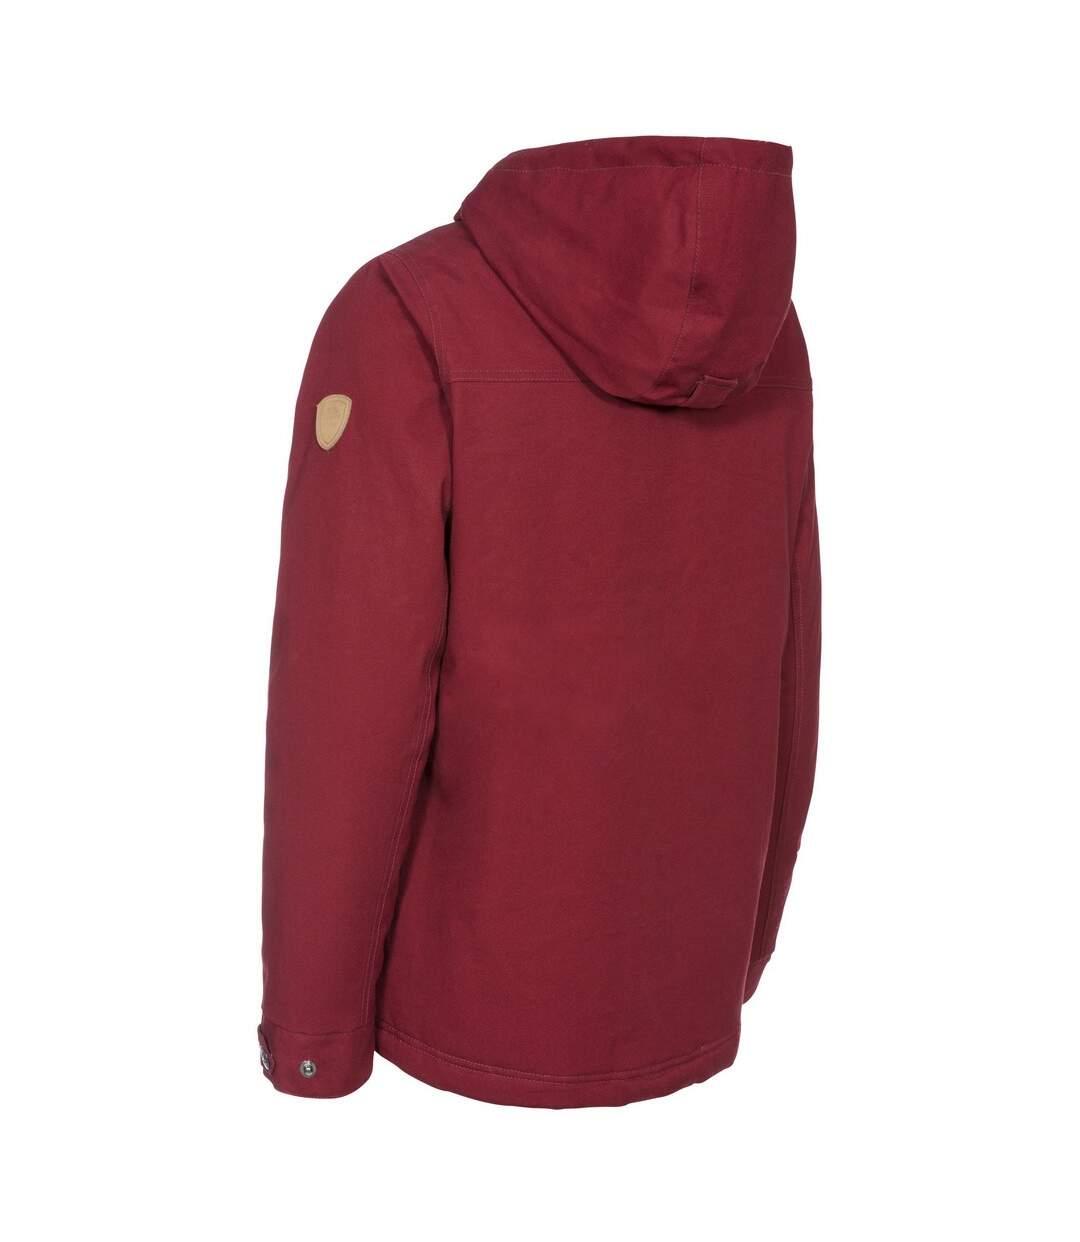 Trespass Womens/Ladies Devoted Waterproof Jacket (Merlot) - UTTP4817